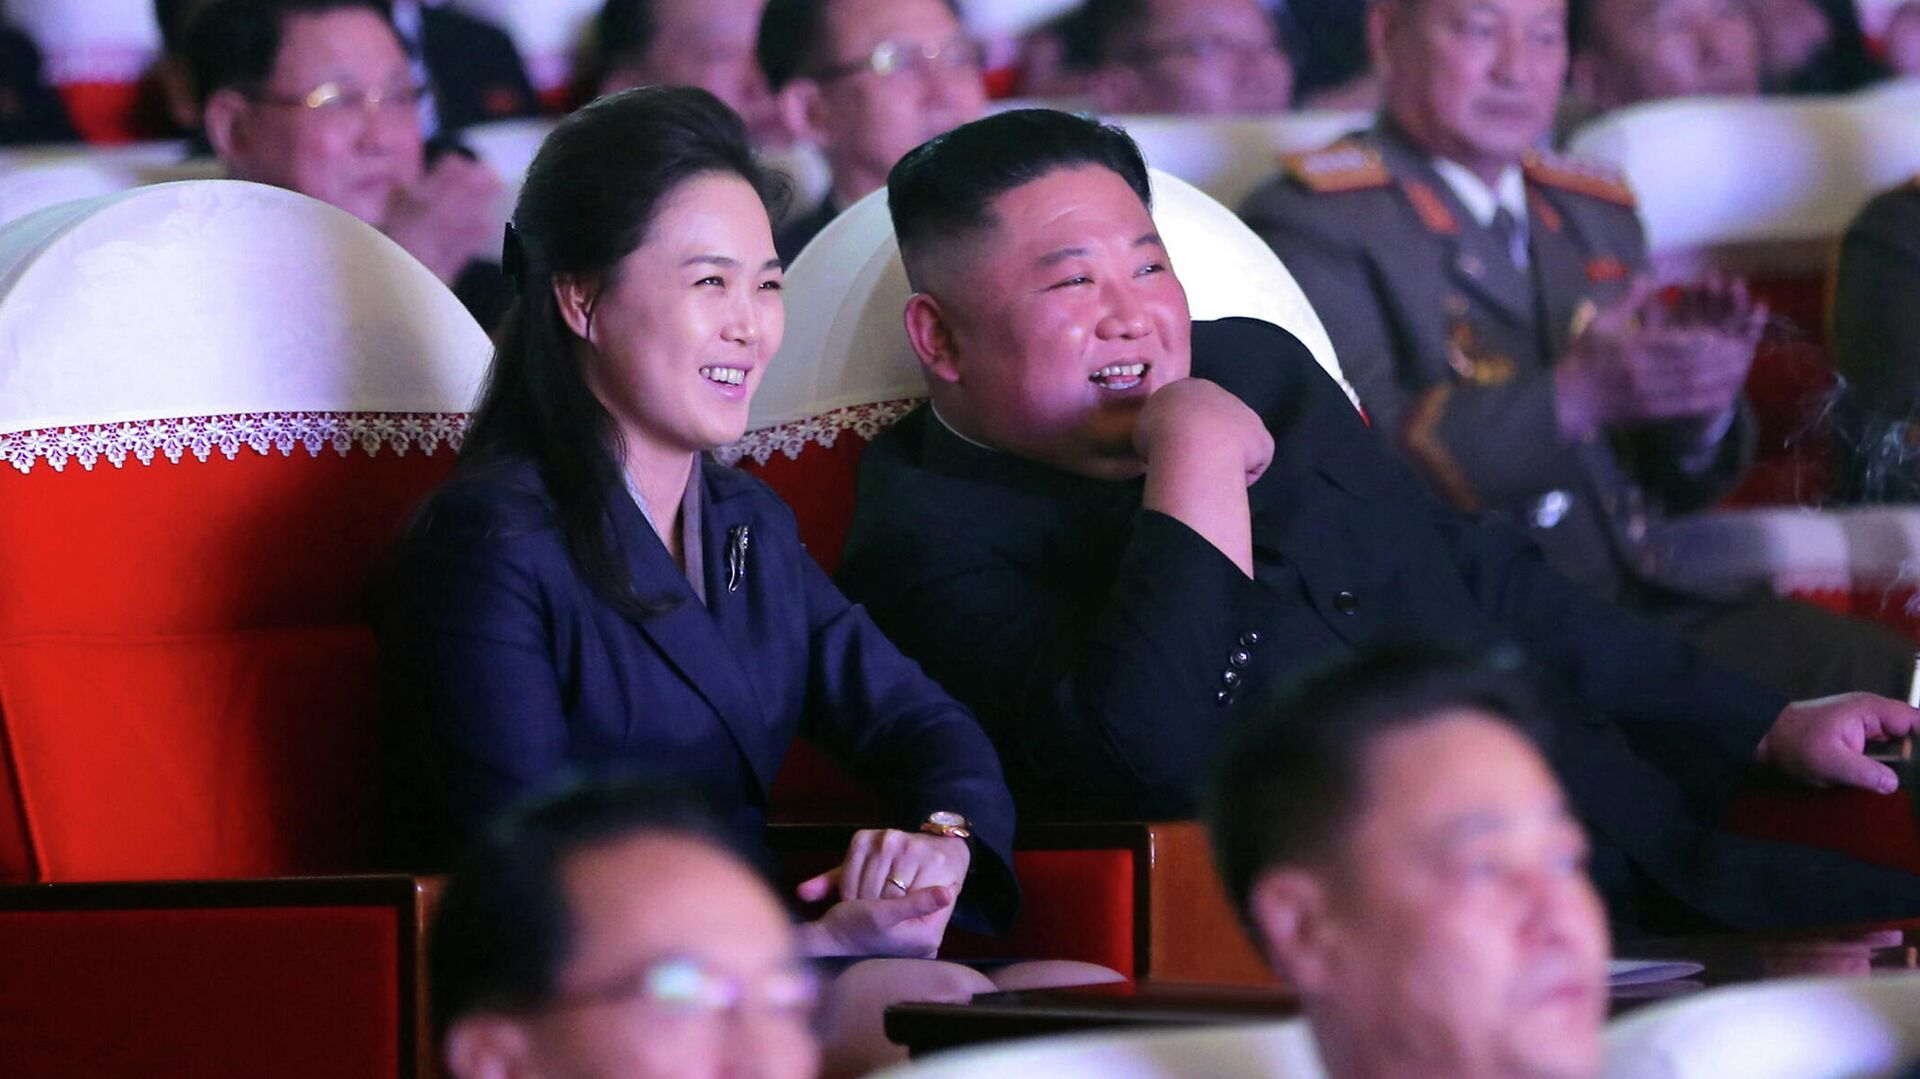 Ri Sol-ju junto a su esposo, Kim Jong-un - Sputnik Mundo, 1920, 17.02.2021